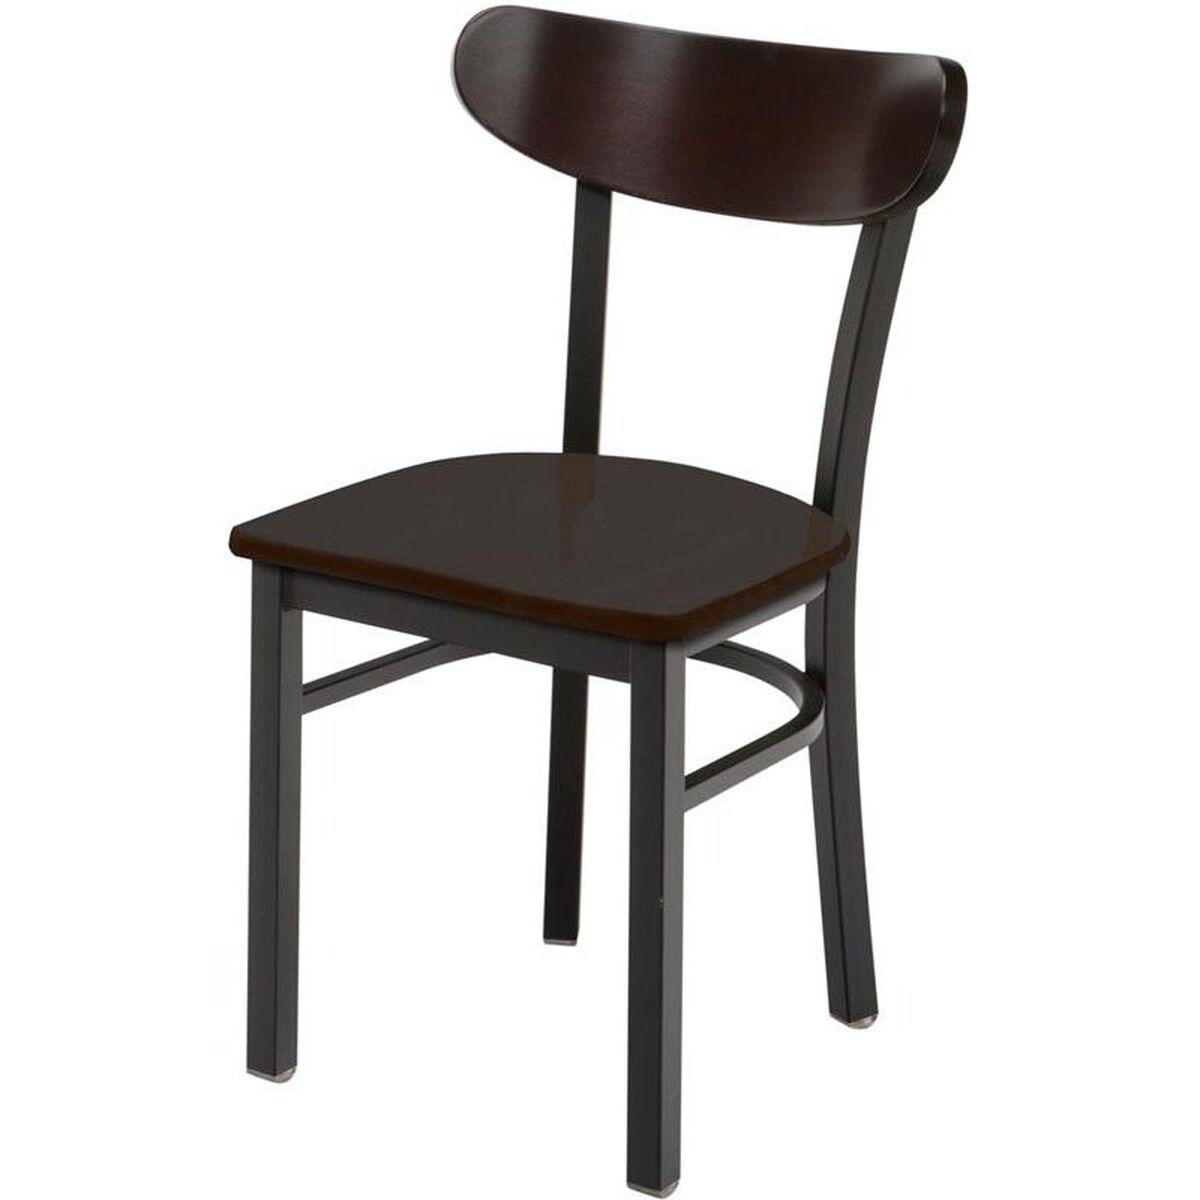 Cafe Chair Wood Seat 3319K-WOOD | RestaurantFurniture4Less.com